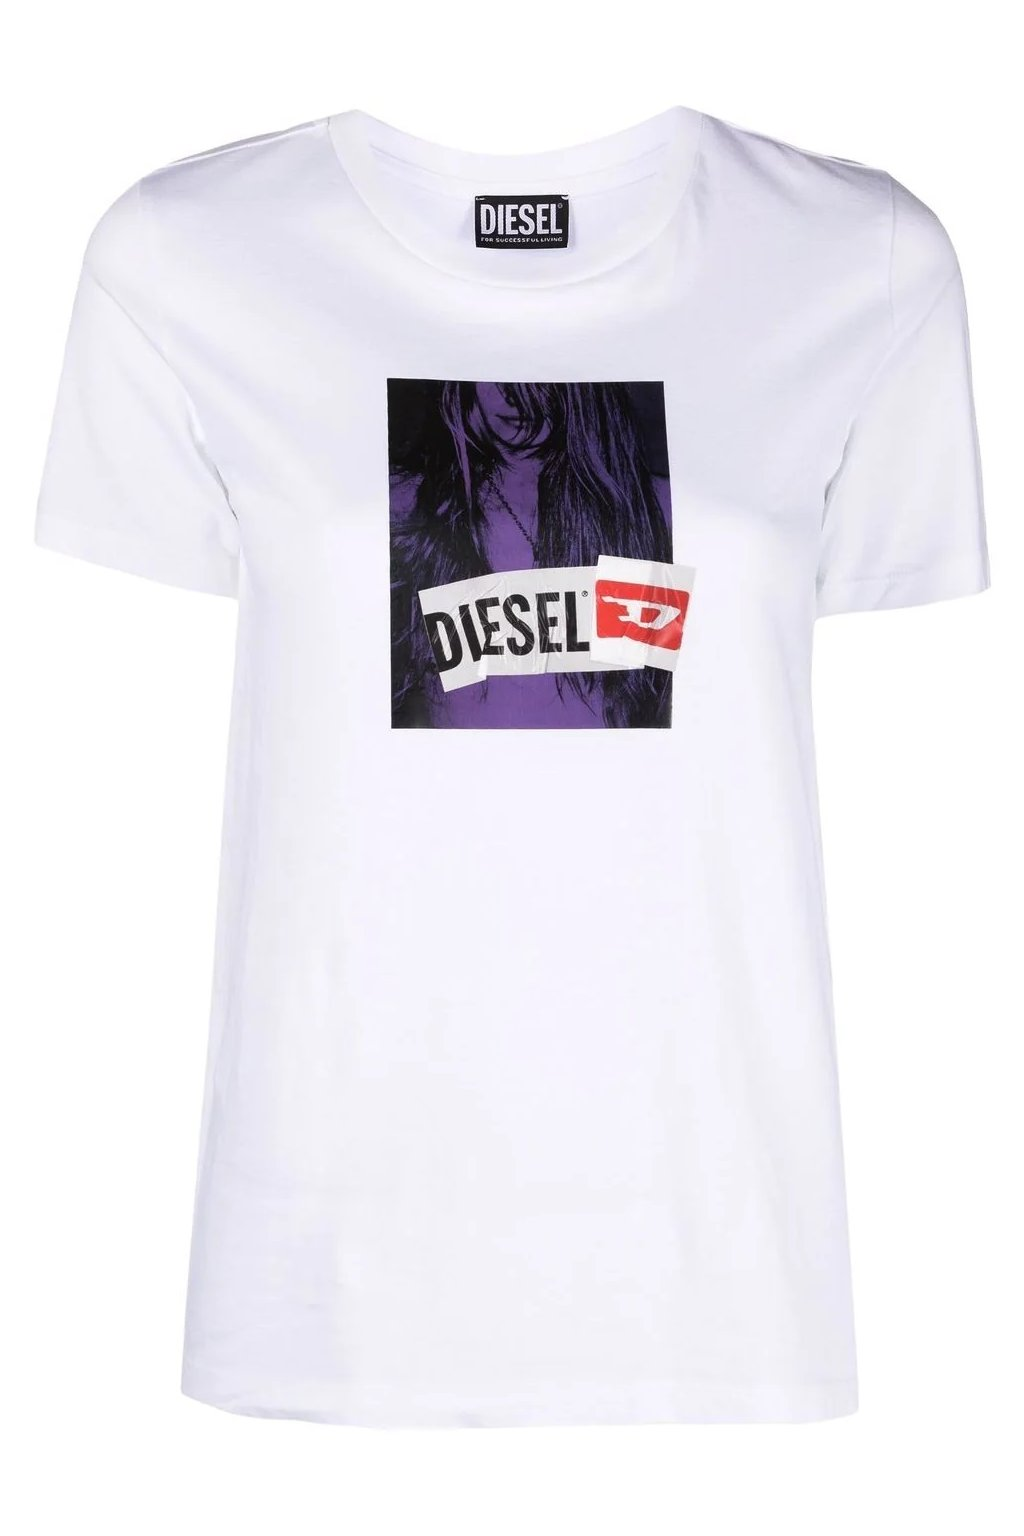 Dámské tričko Diesel T sily B3 bílé